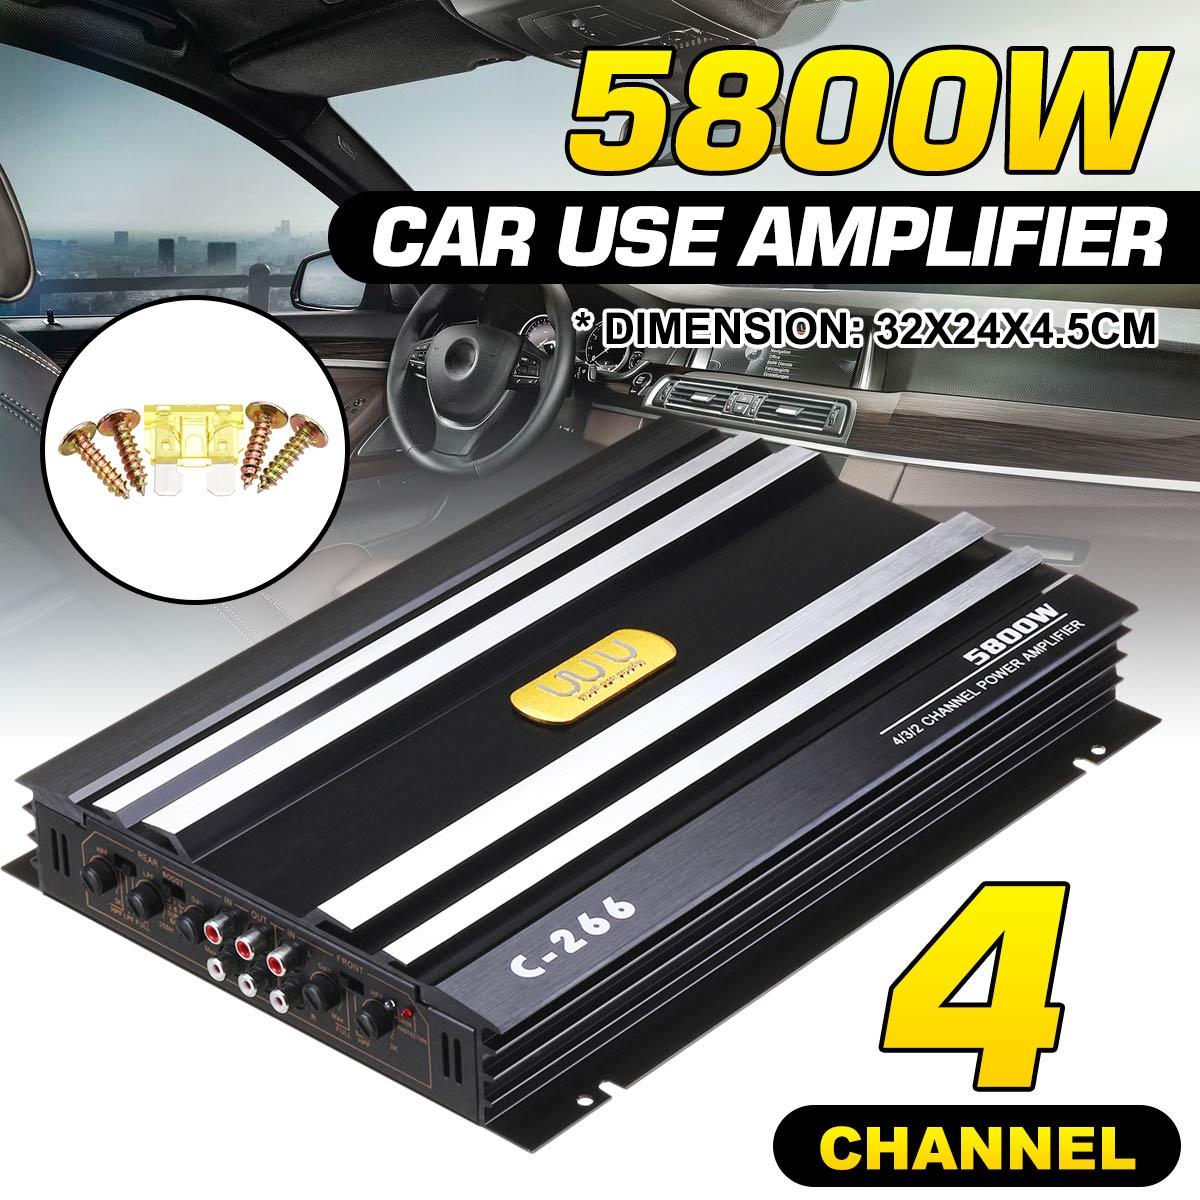 5800W Car Home Audio Power Amplifier 4 Channel 12V Car Digital Amplifer Car Audio Amplifier for Cars